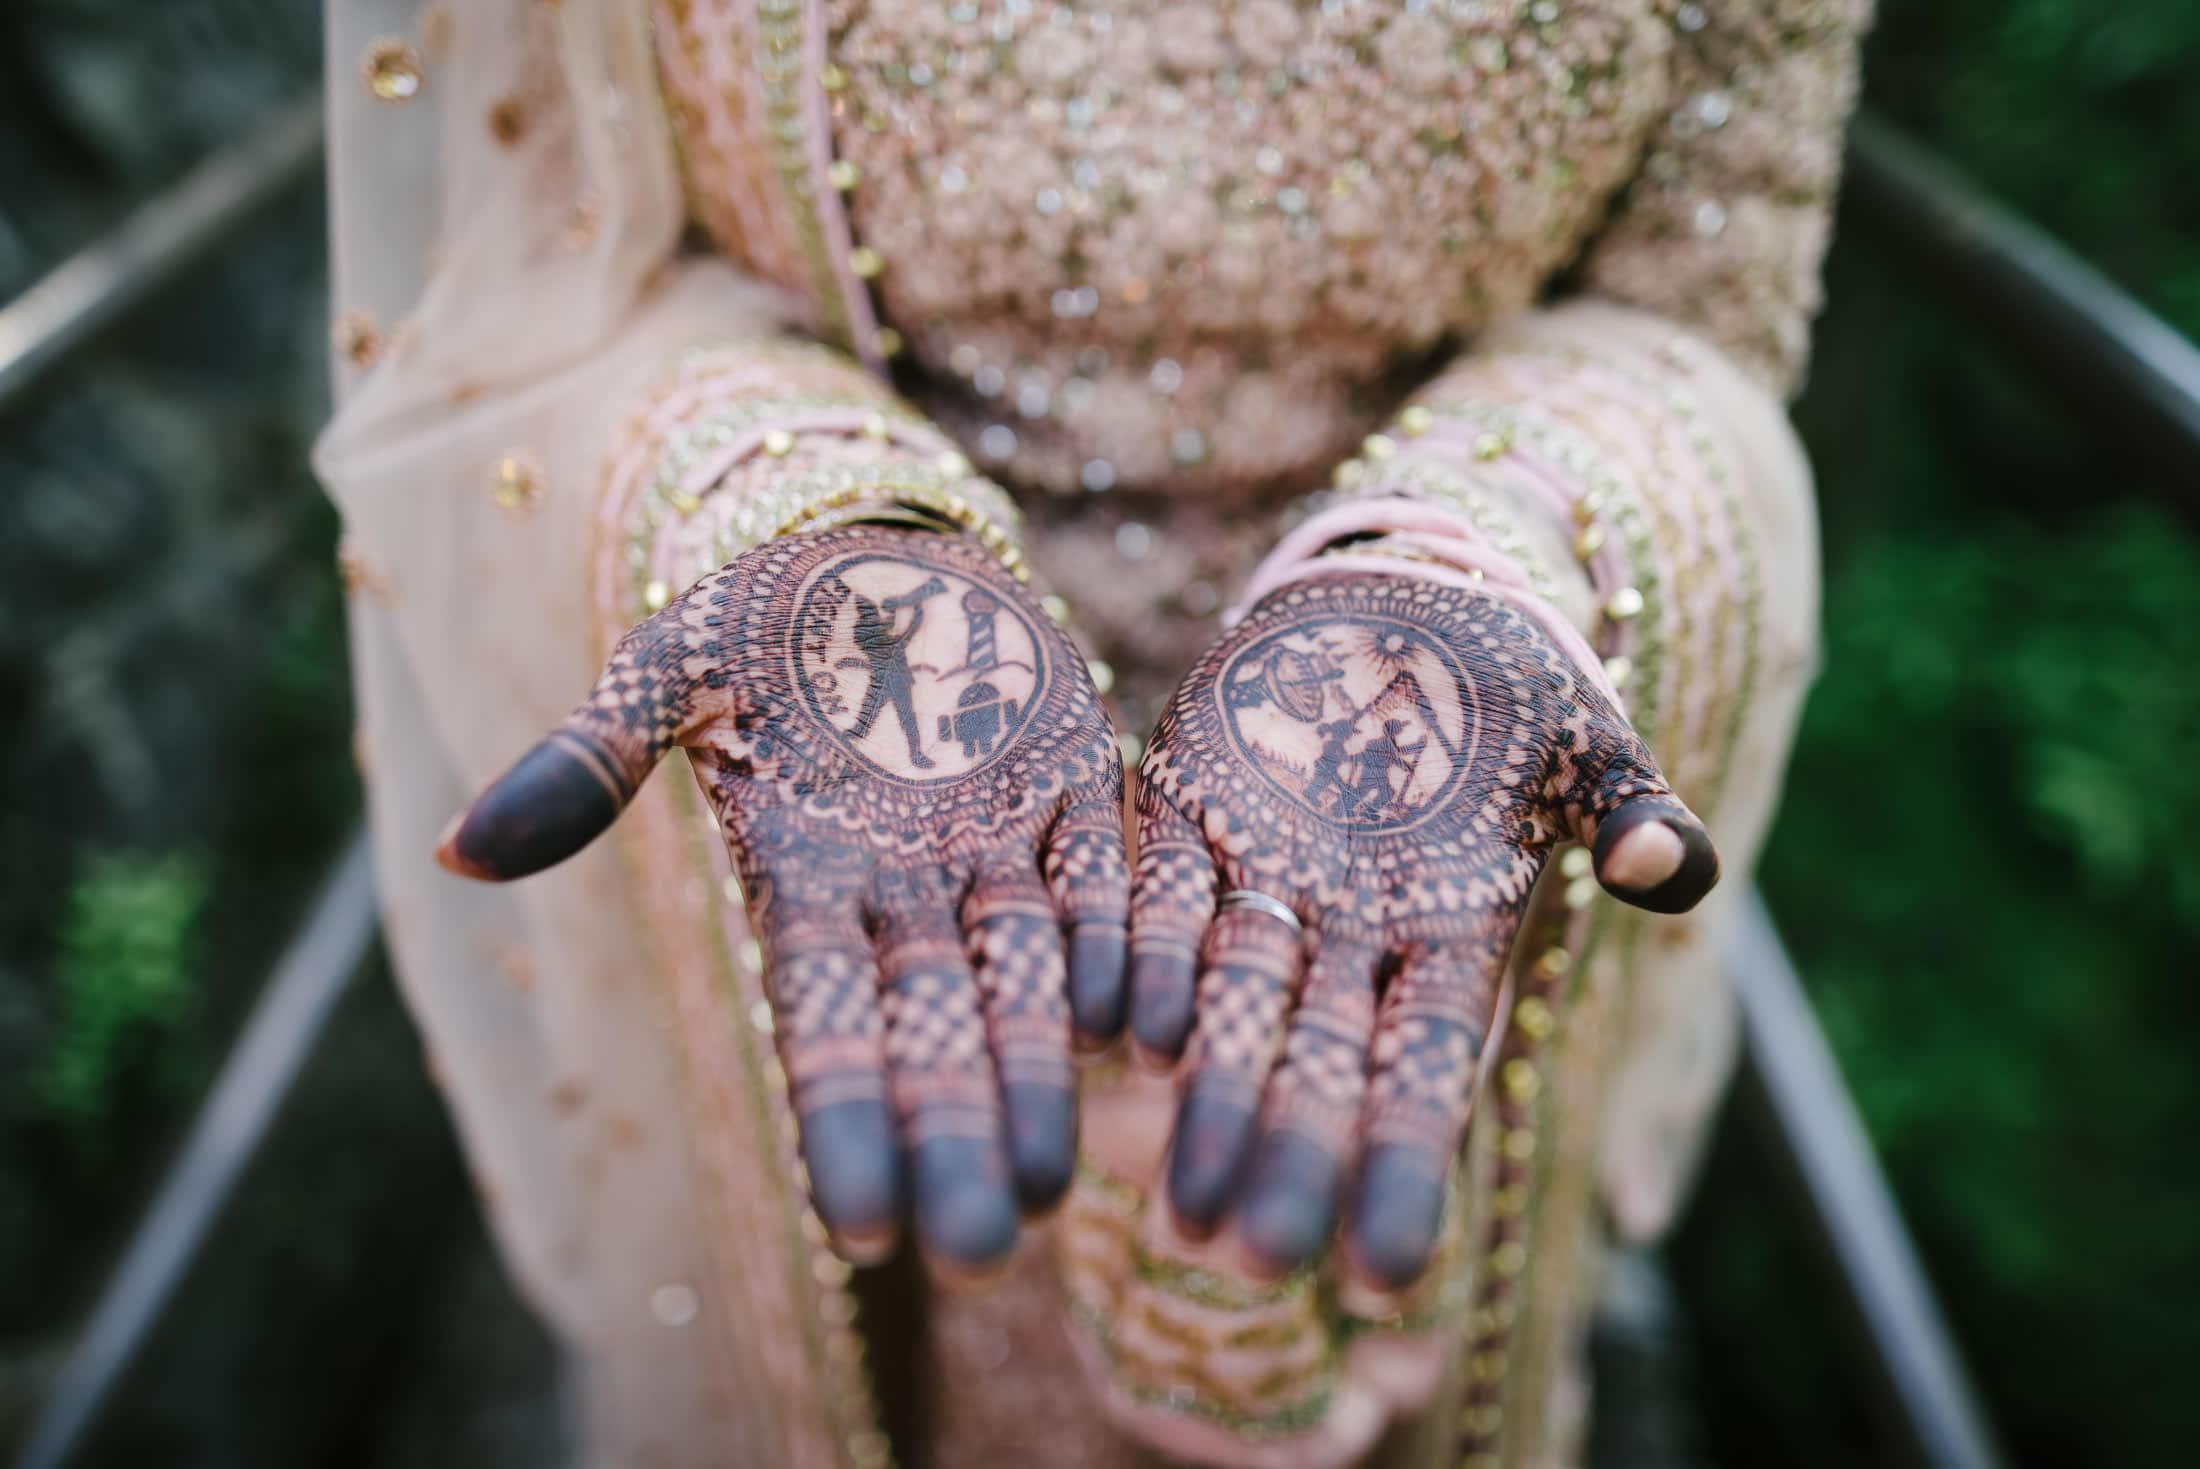 Cool Henna on Bride's Hands at Brazil Room in Berkeley